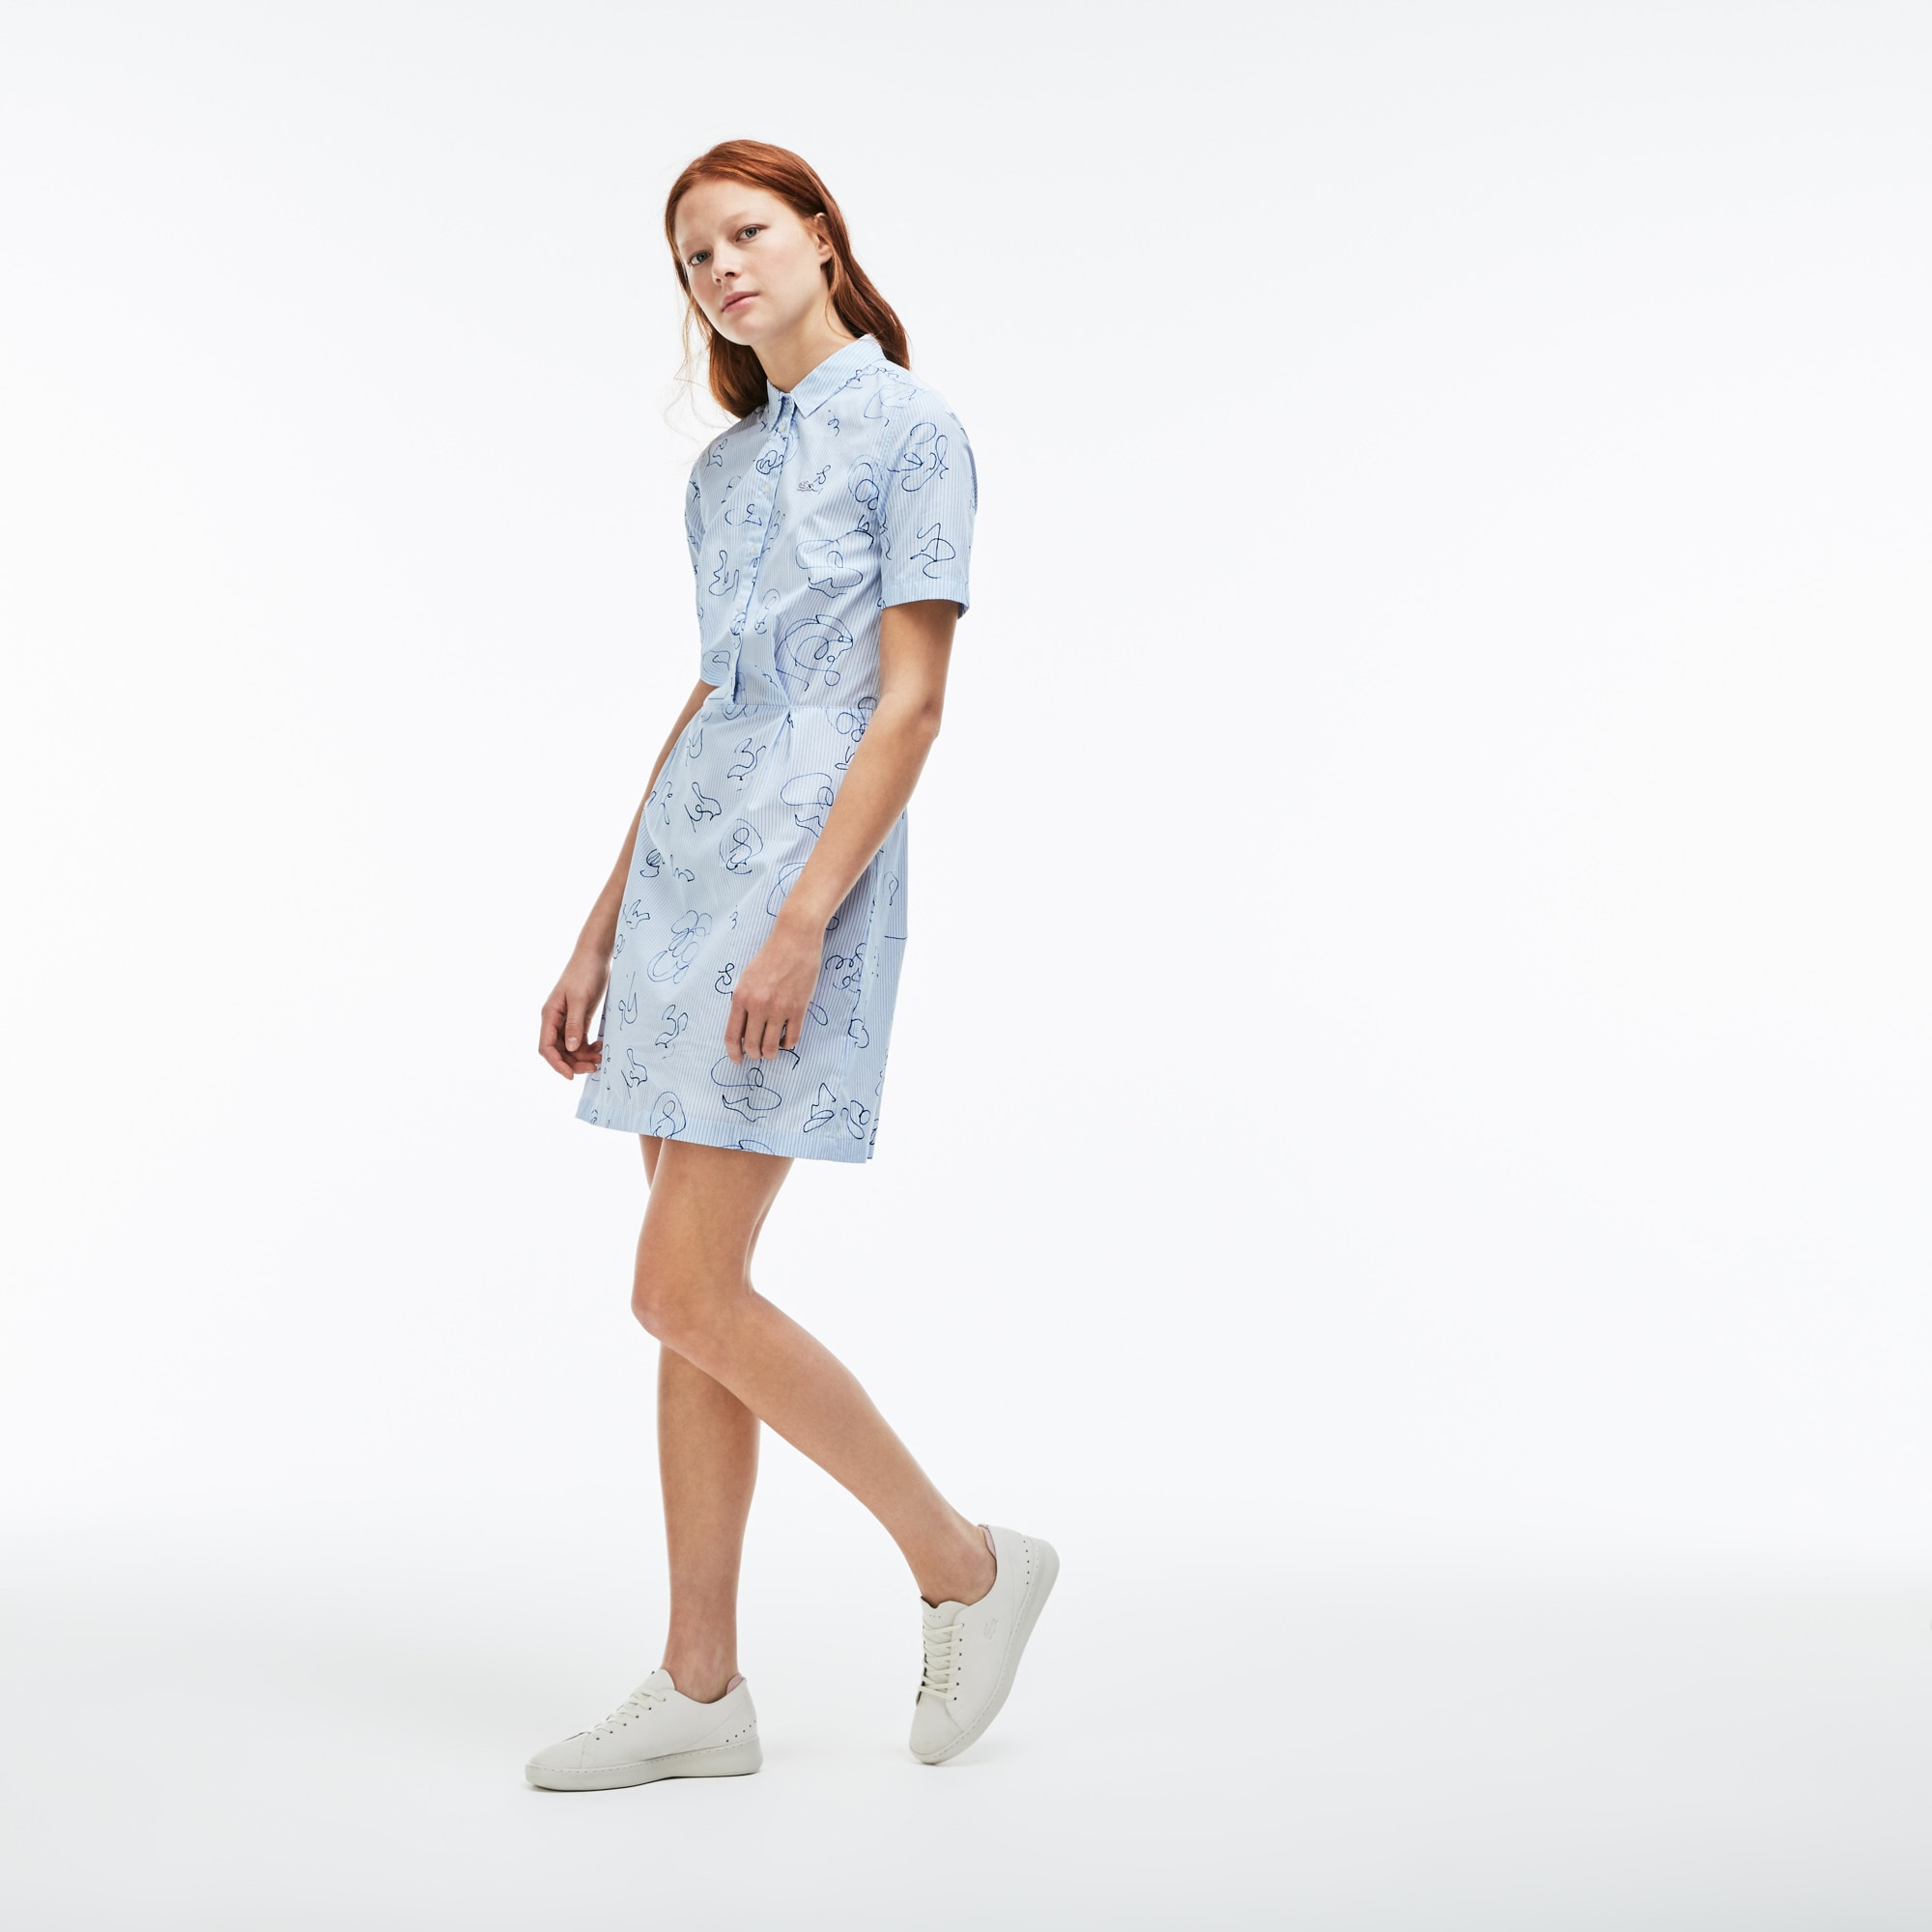 Damen LACOSTE LIVE Popeline Hemdkleid mit Streifenprint